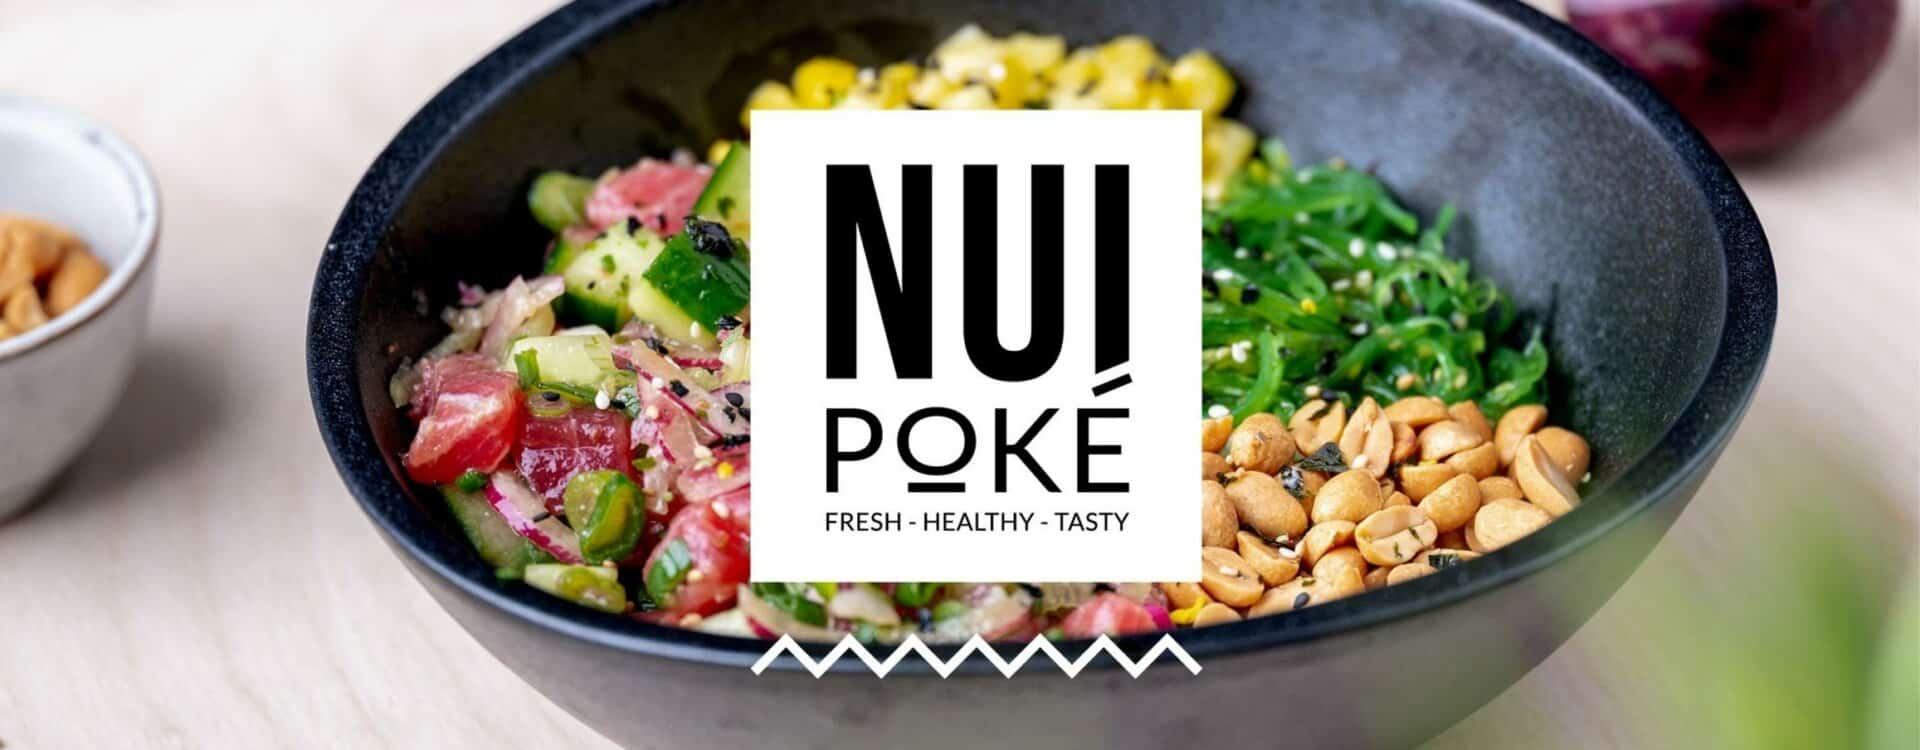 Branding Nui Poké